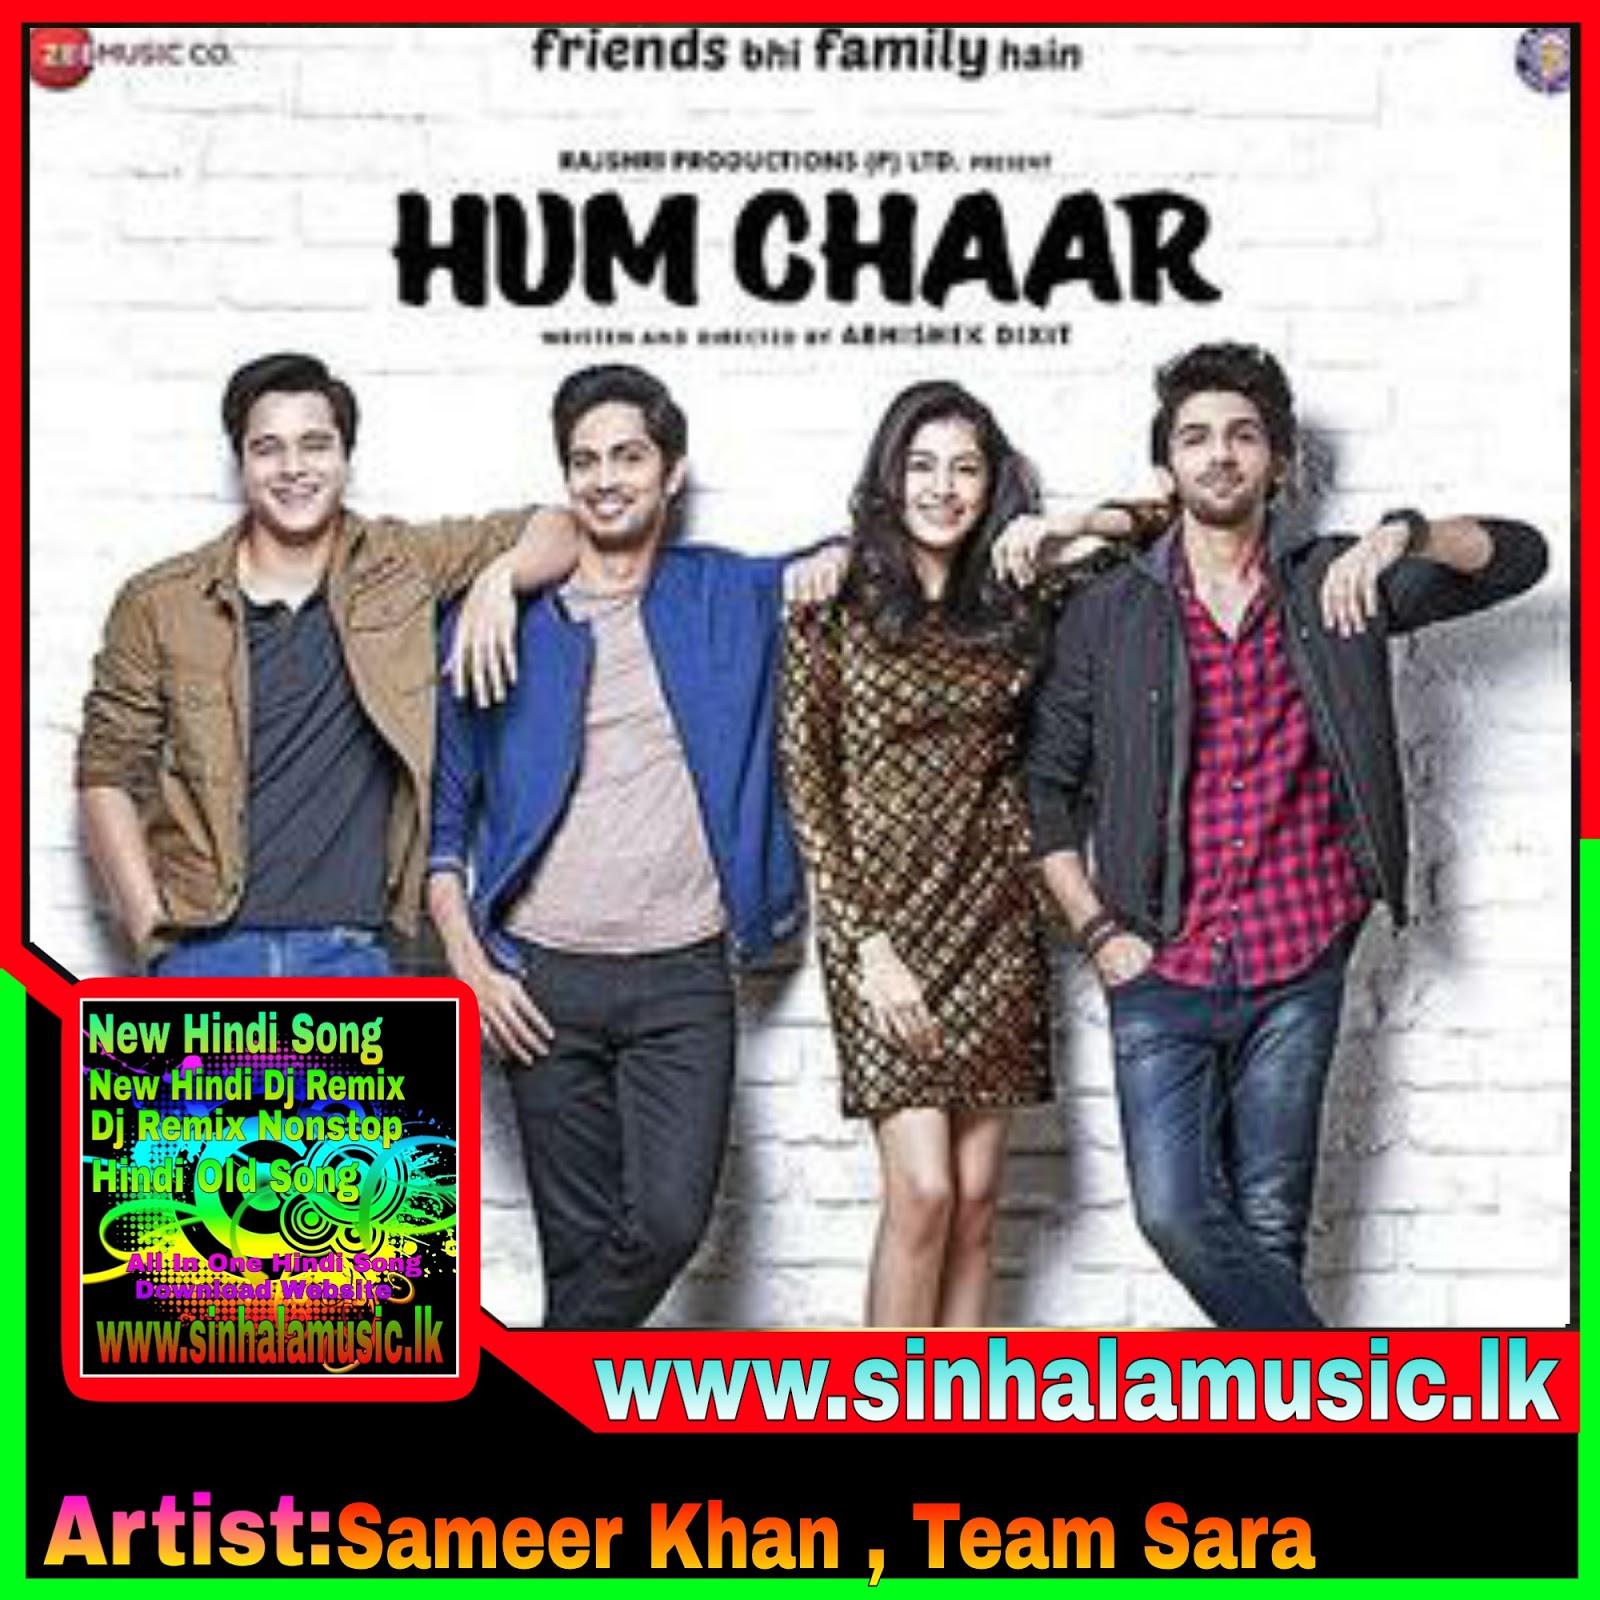 Tum Aisi Kyun Ho - Hum Chaar - MP3 Song Download - sinhalamusic lk